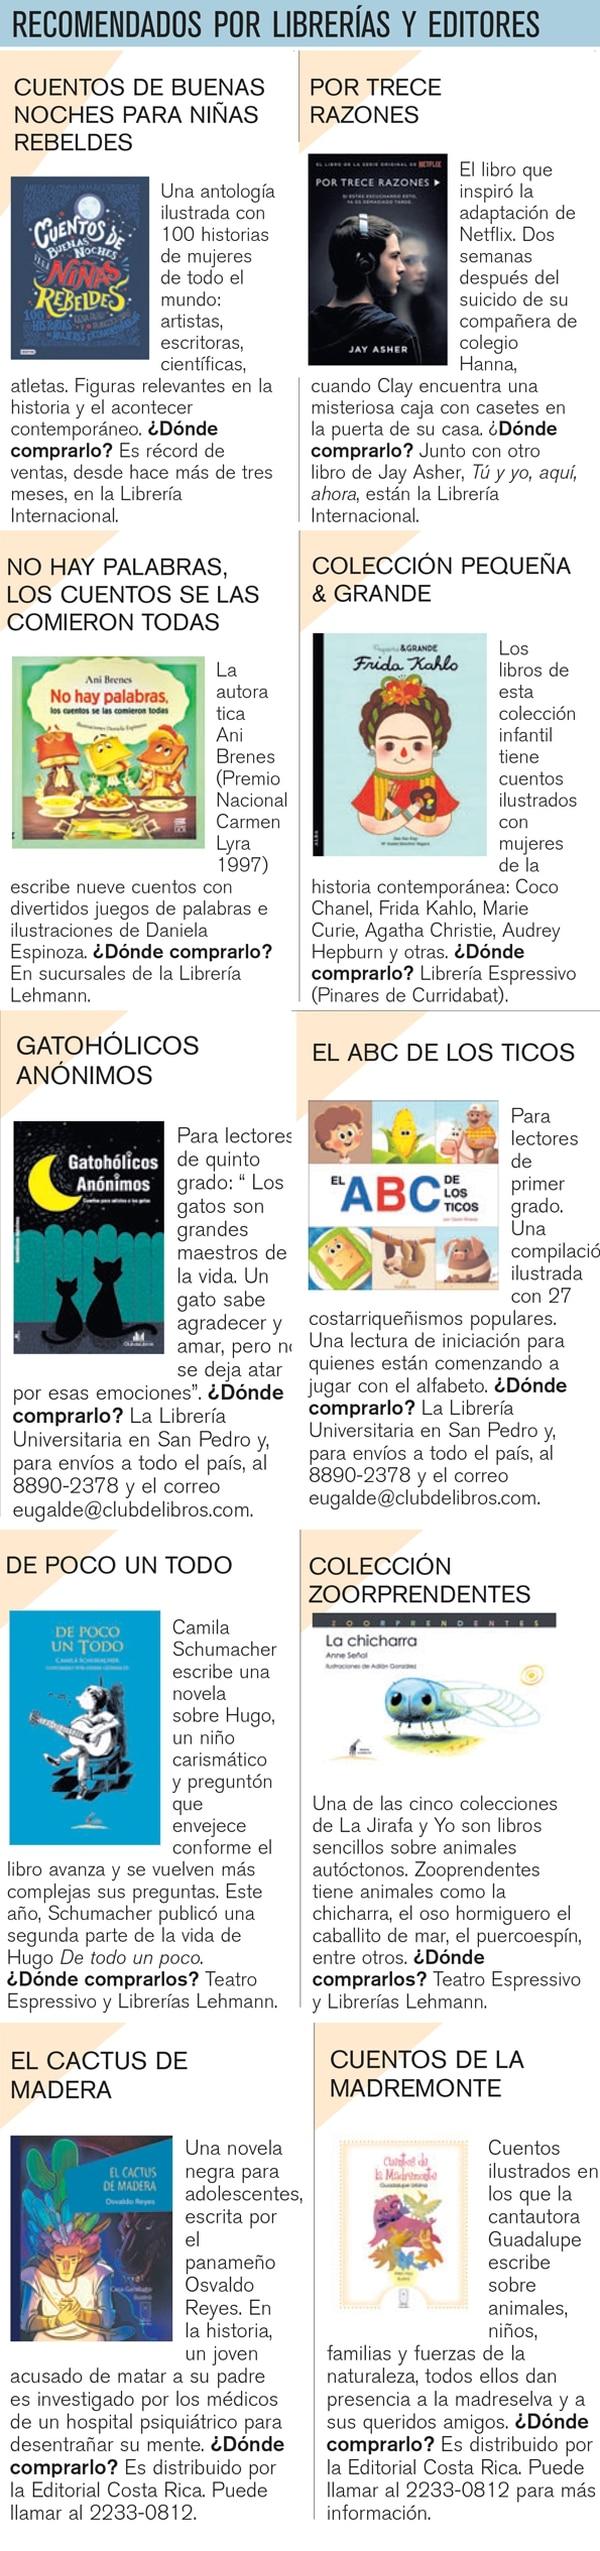 Recomendaciones de lectura infantil y juvenil.